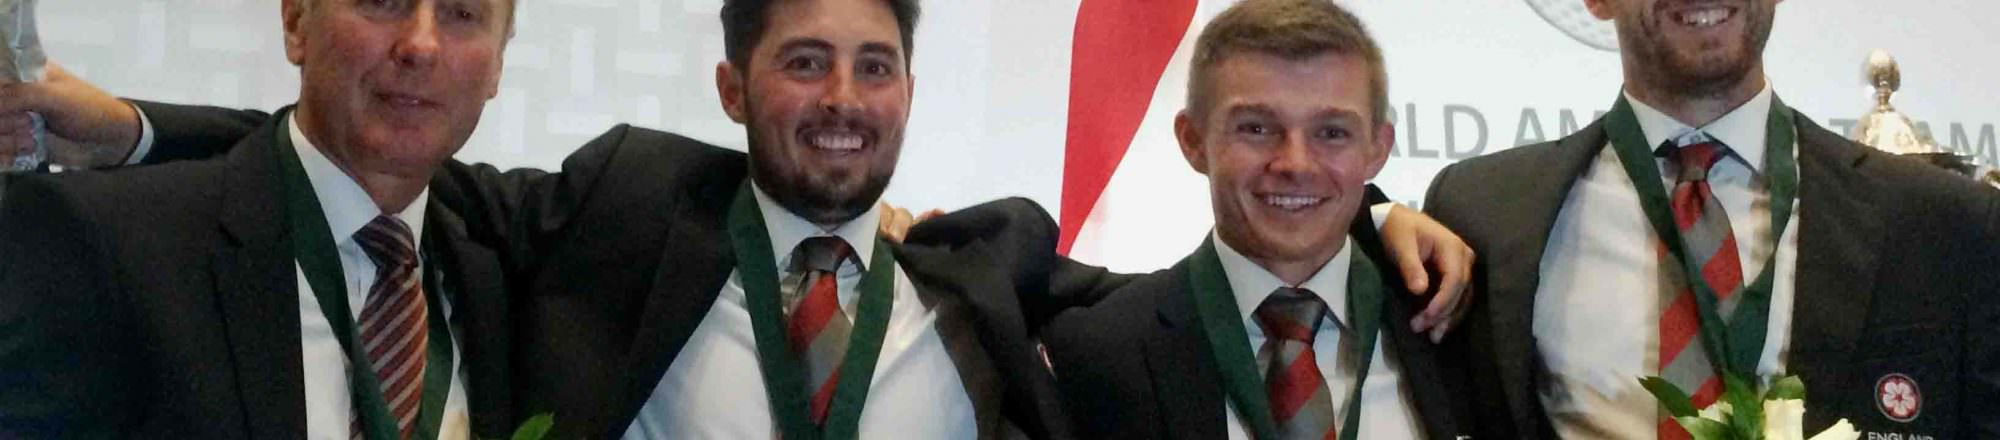 England Golf: NCG meets...Alfie Plant